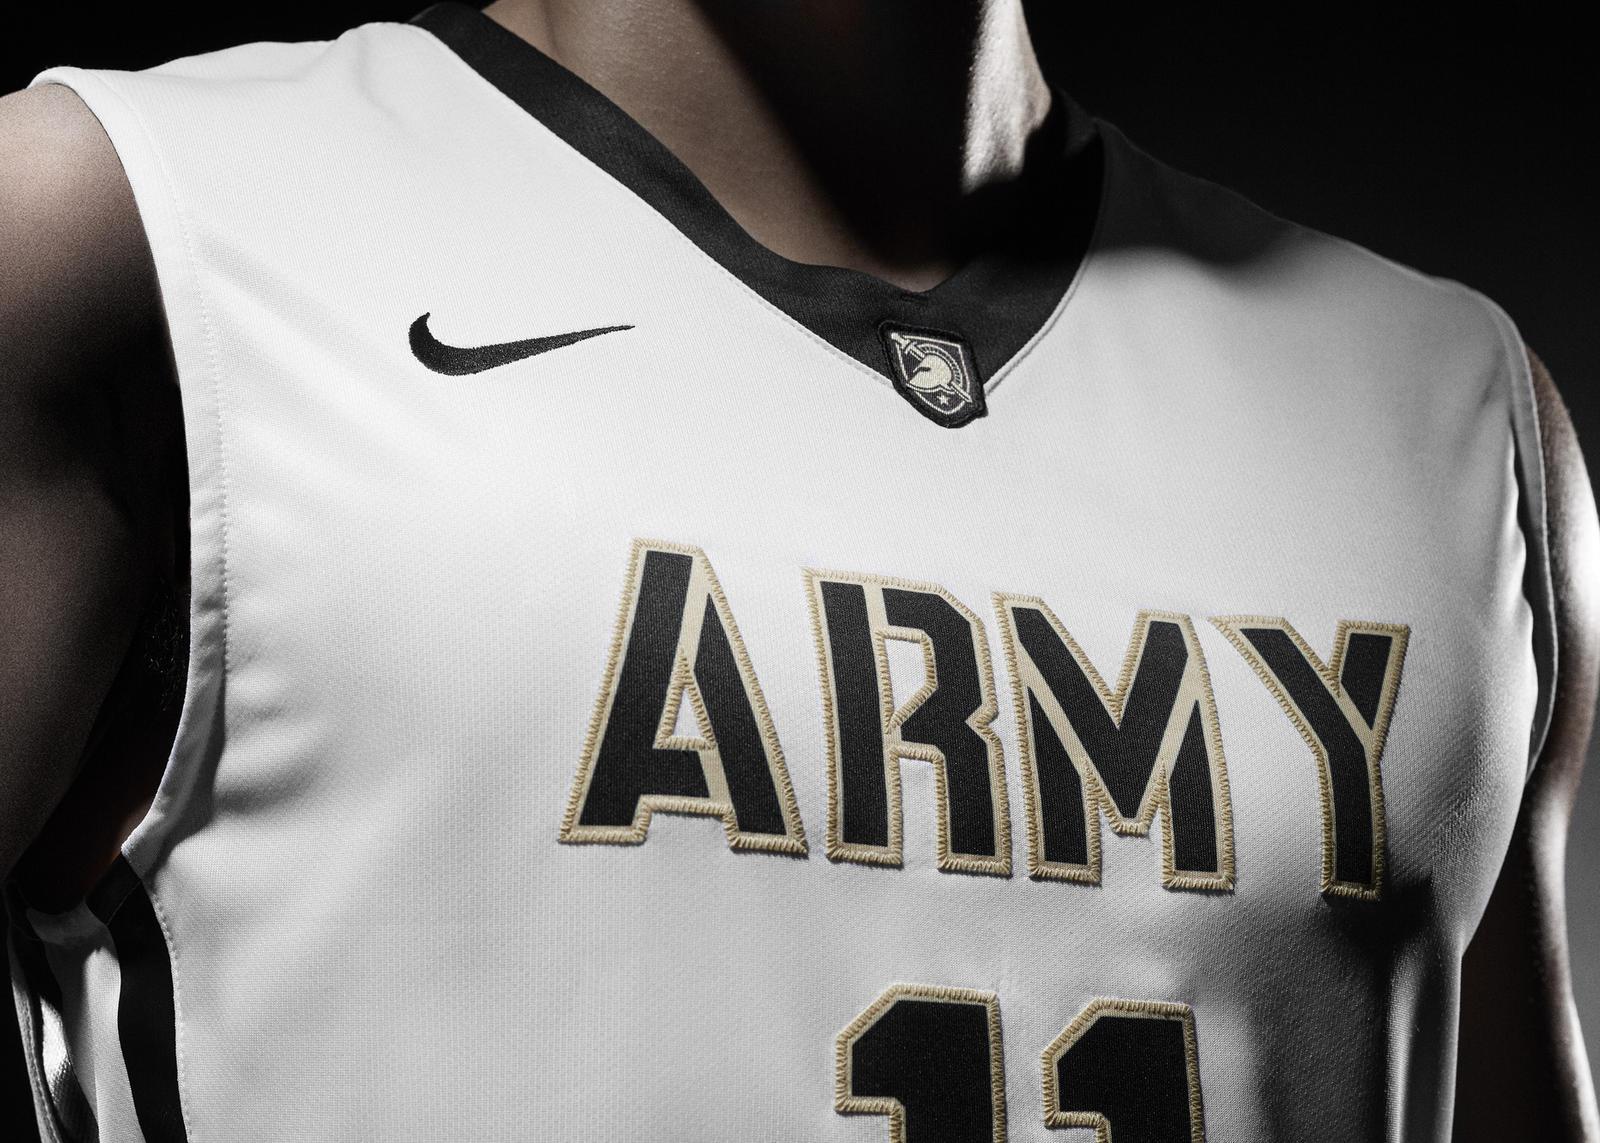 1976200042f ... (USMA) to inform the brand evolution. Nike Army volleyball1.  Nike Army track1. Nike Army basketball4. Nike Army basketball3.  Nike Army basketball2